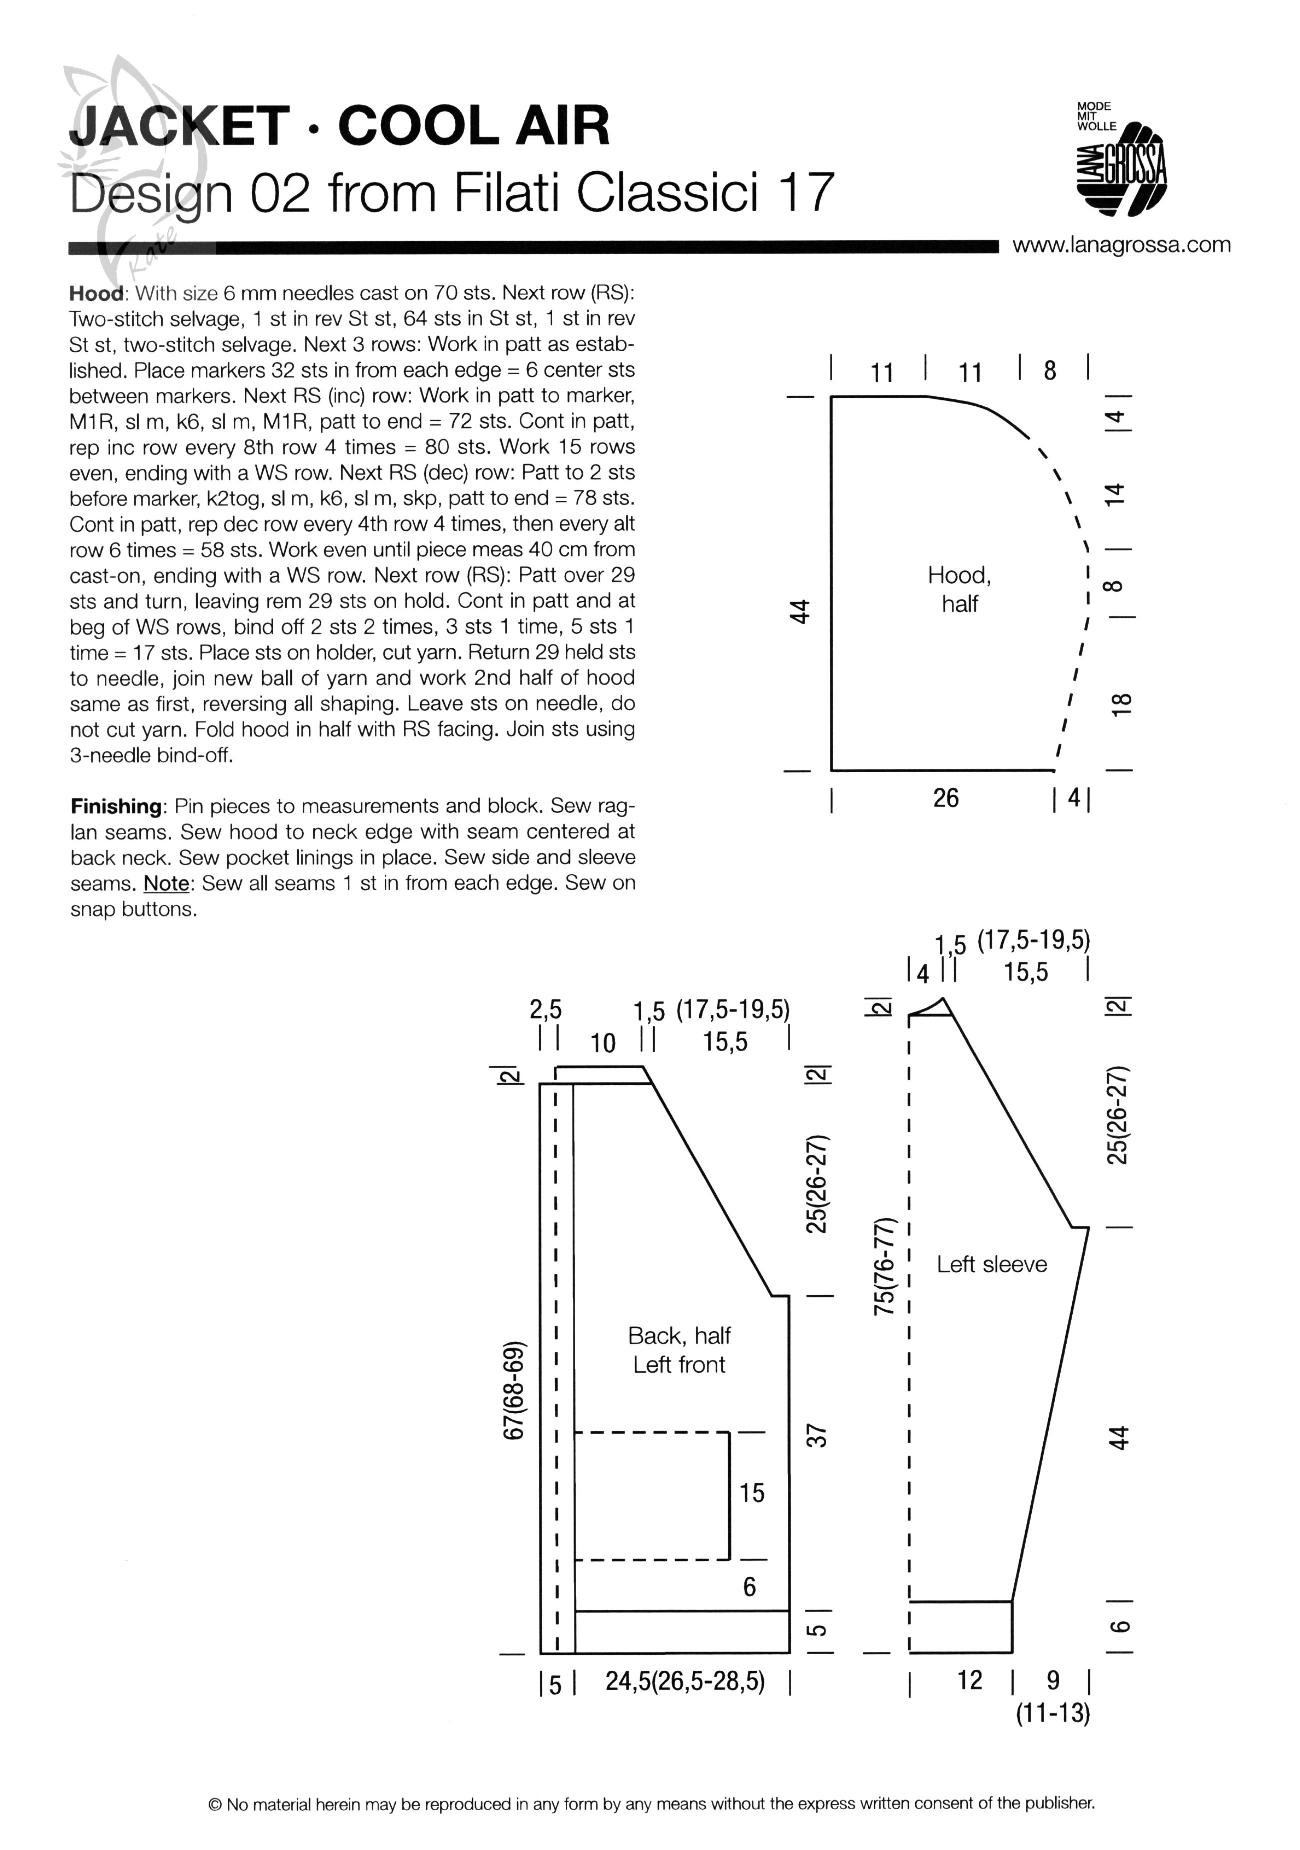 Page_00116.jpg